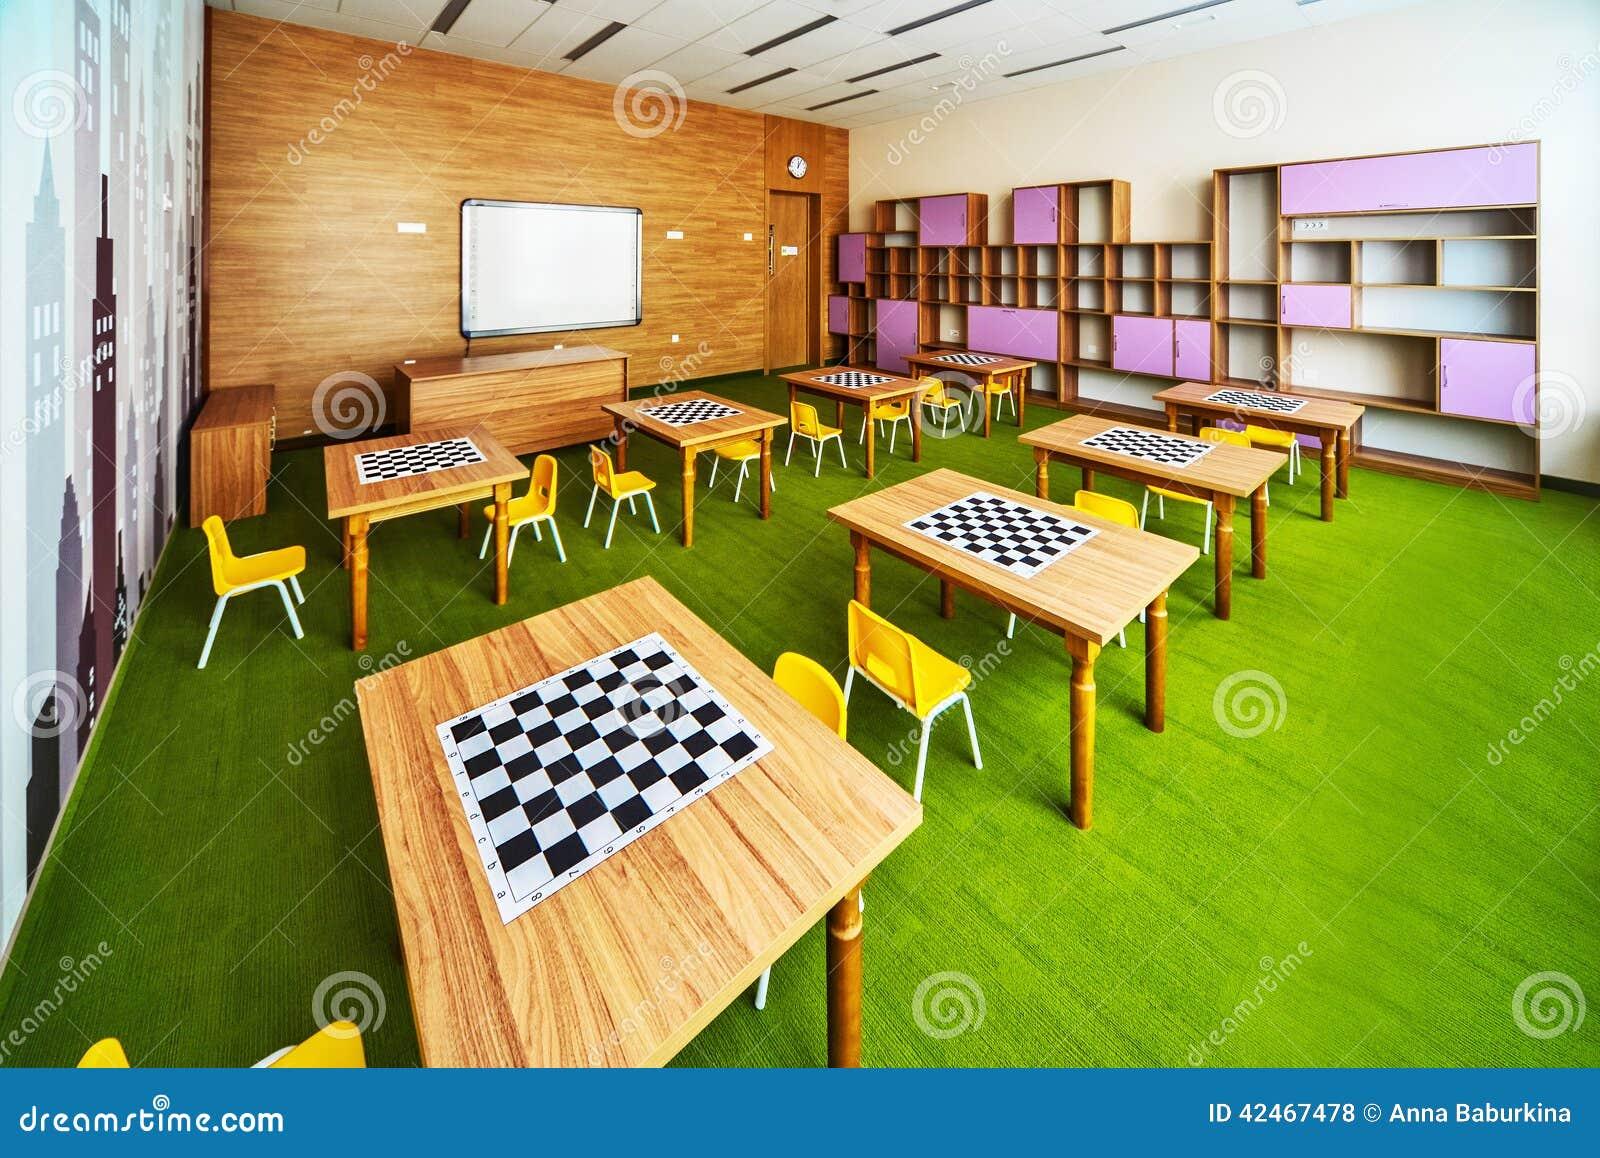 Moderner Schulinnenraum